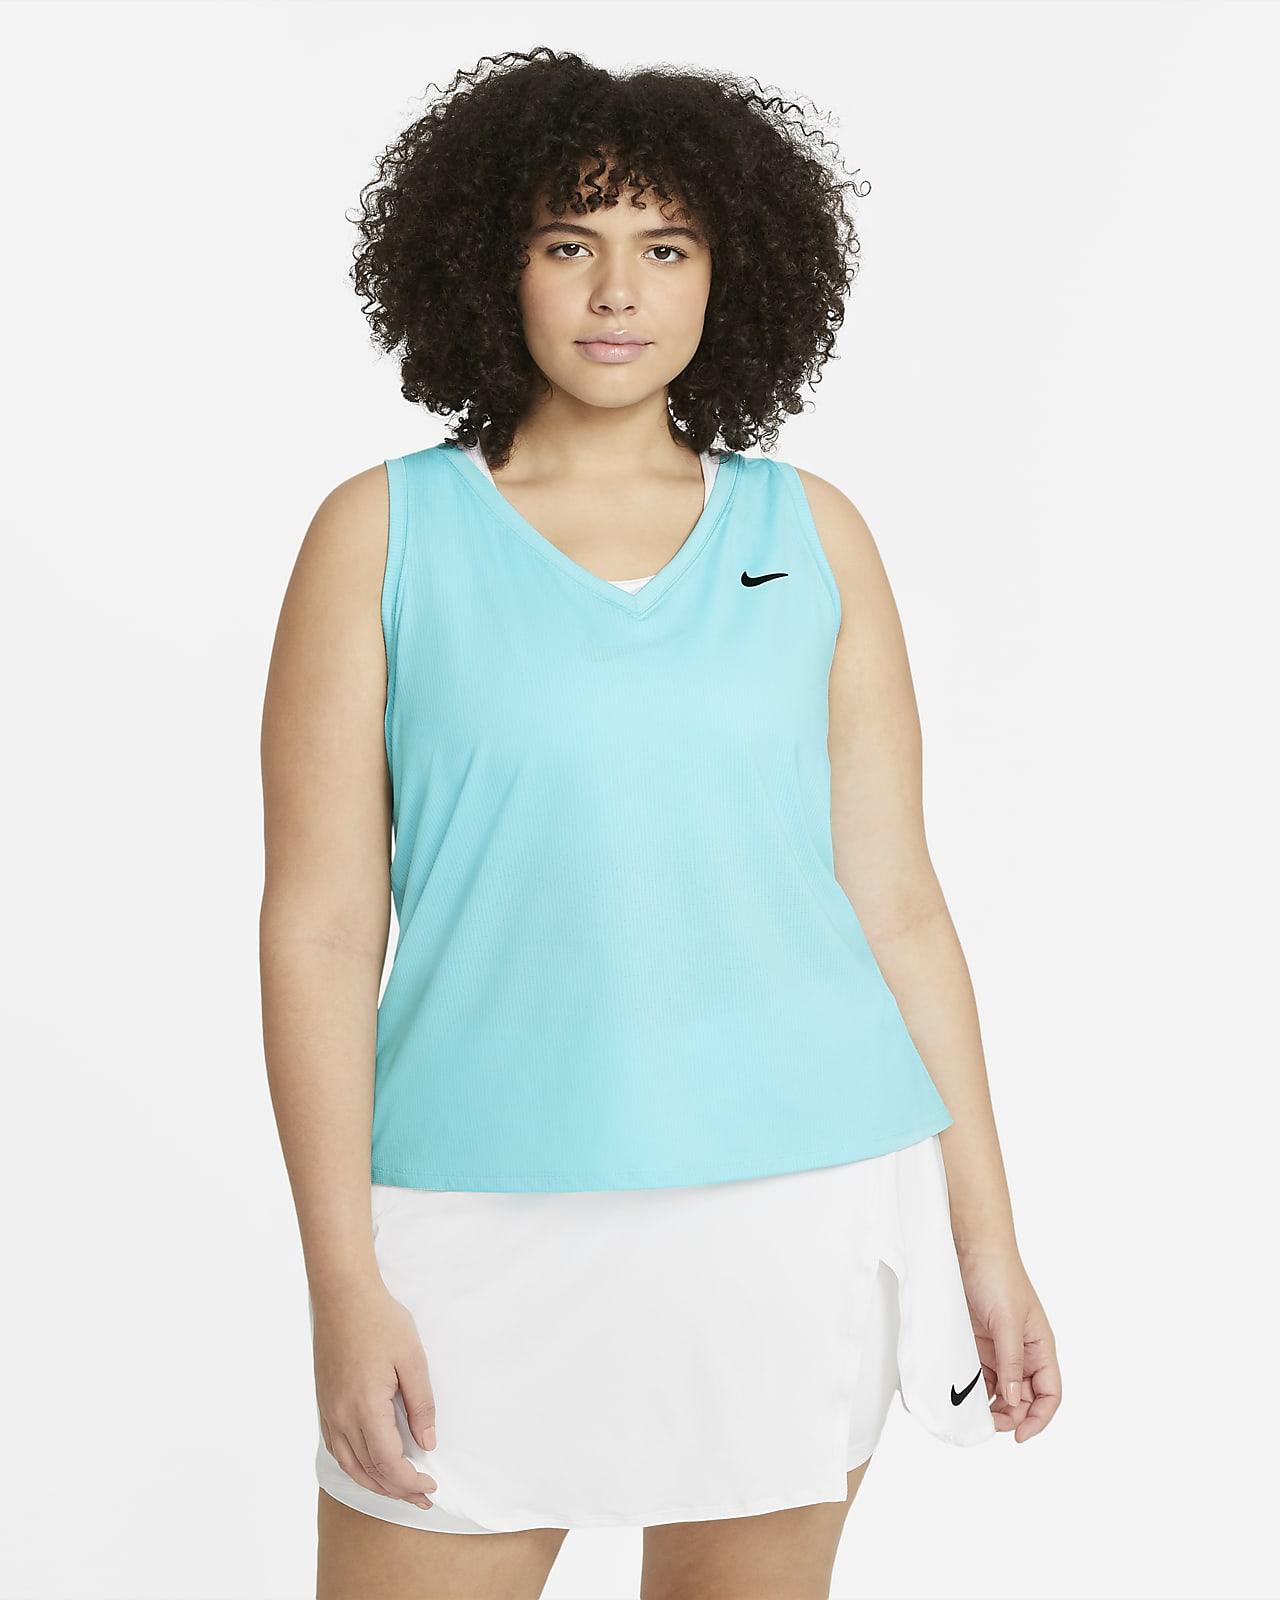 Tennislinne NikeCourt Victory för kvinnor (Plus size)